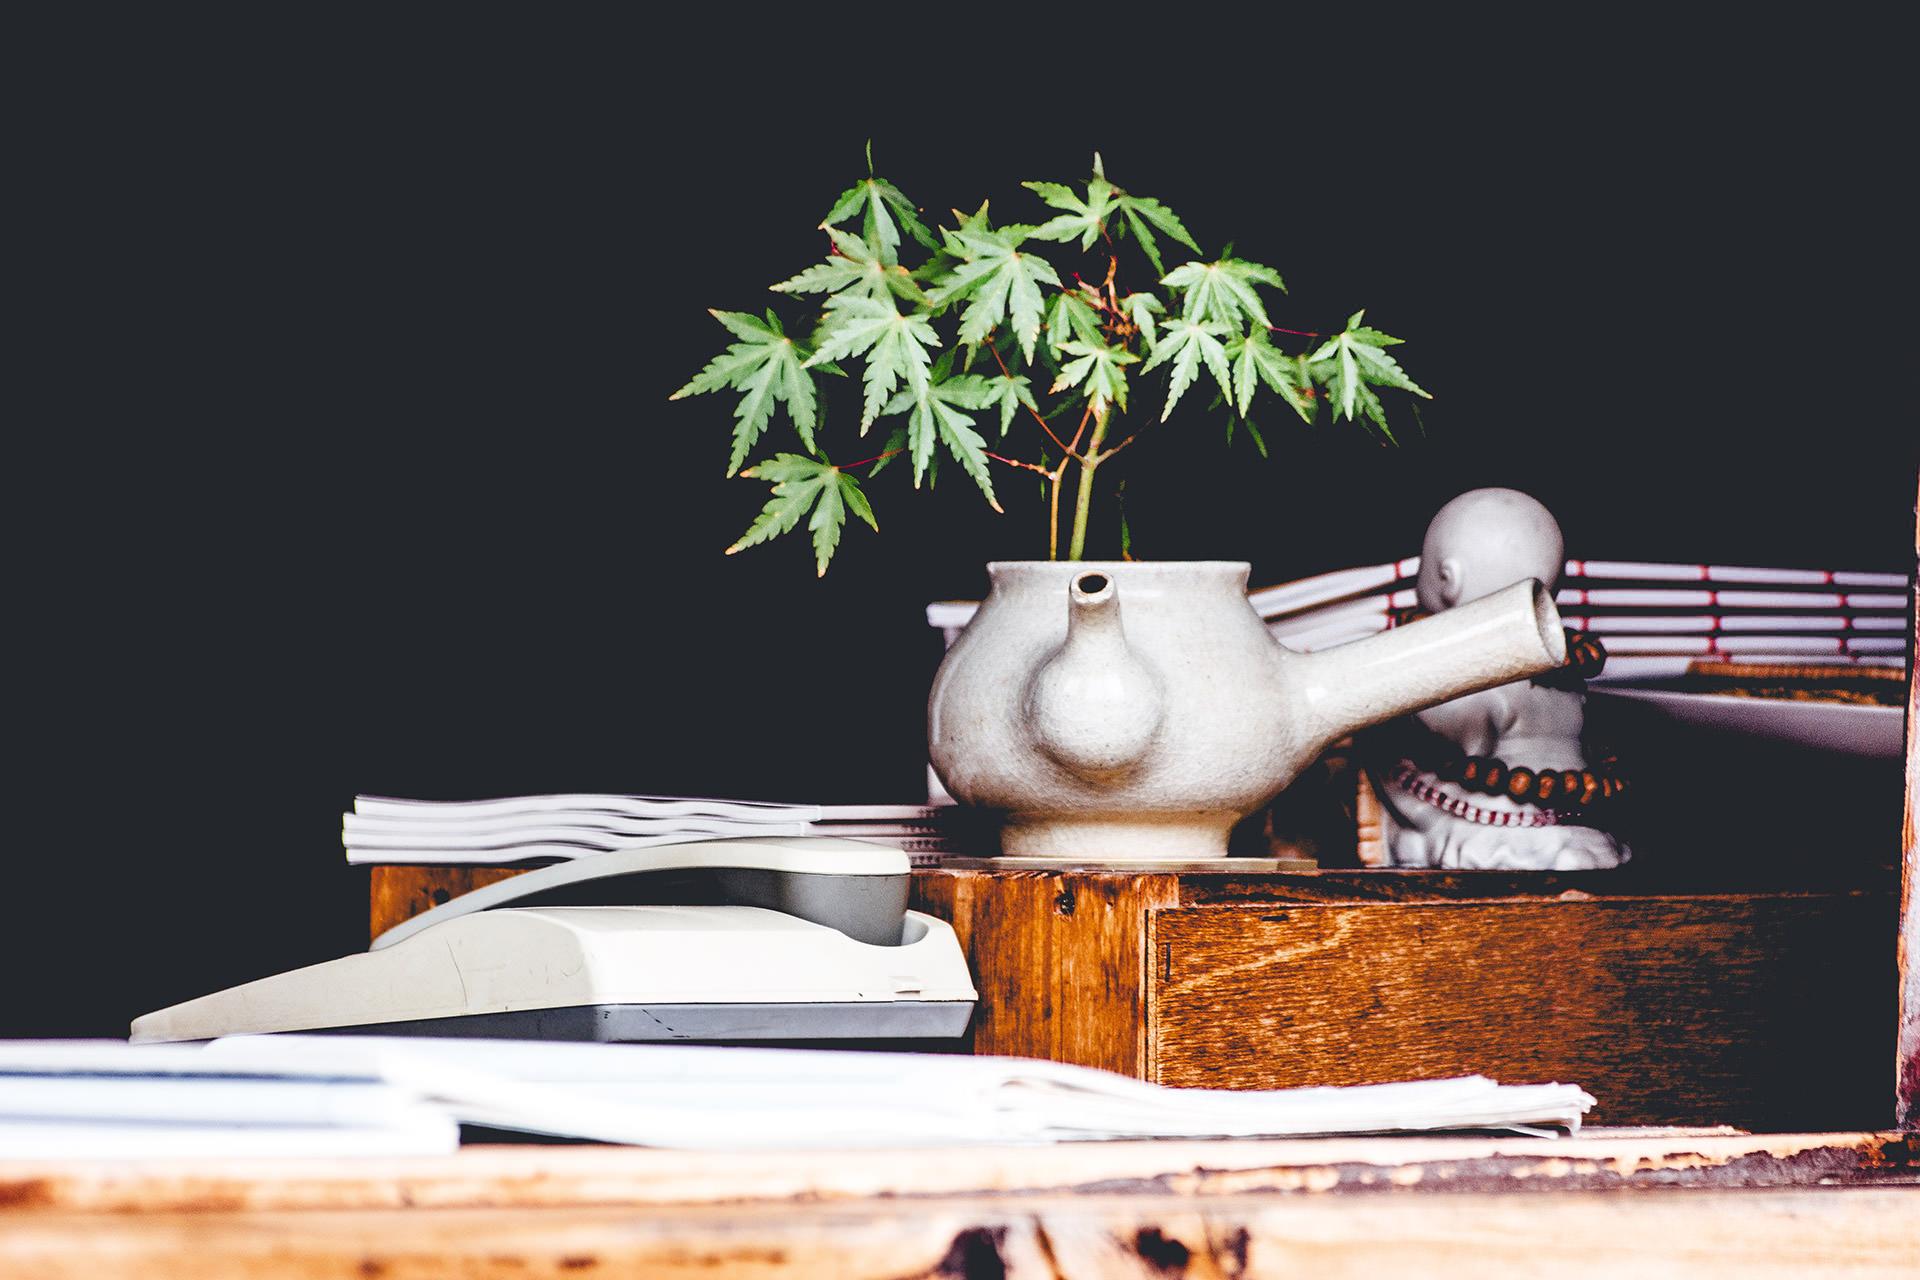 Maceta con planta de marihuana sobre escritorio